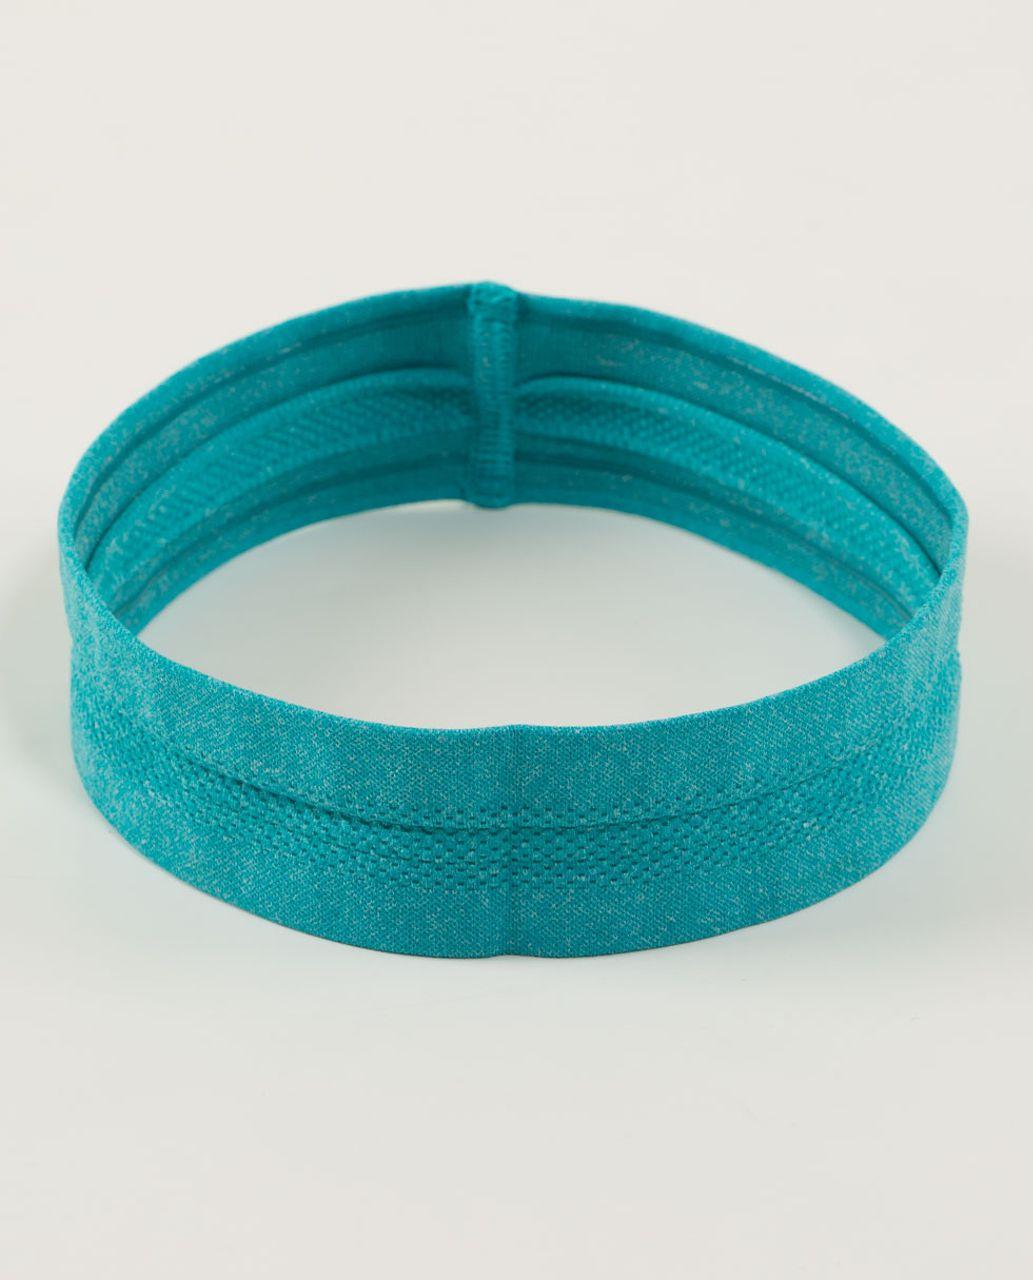 Lululemon Swiftly Headband - Heathered Surge